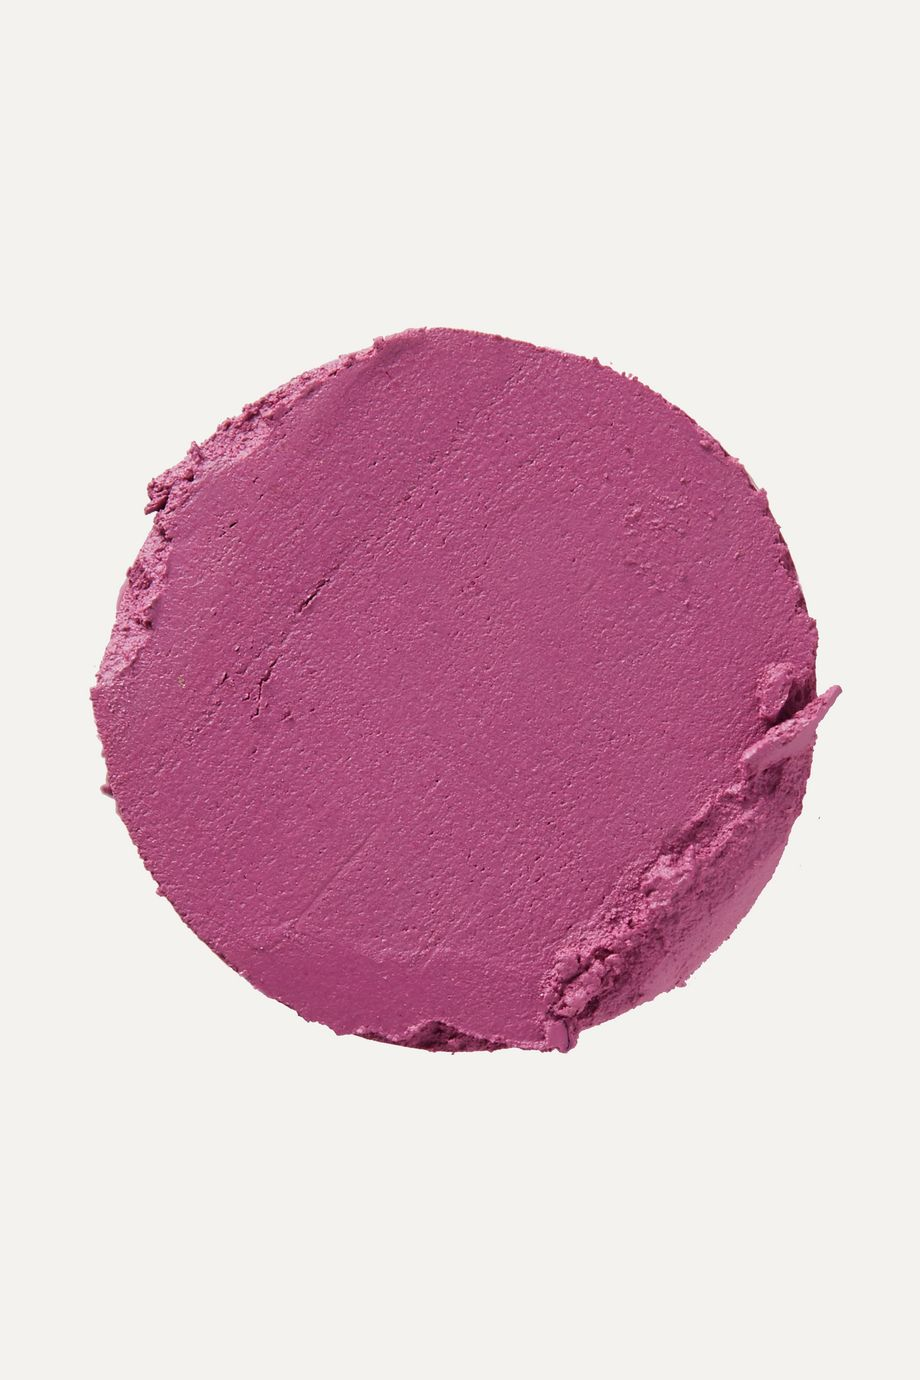 Illamasqua Antimatter Lipstick - Celestial